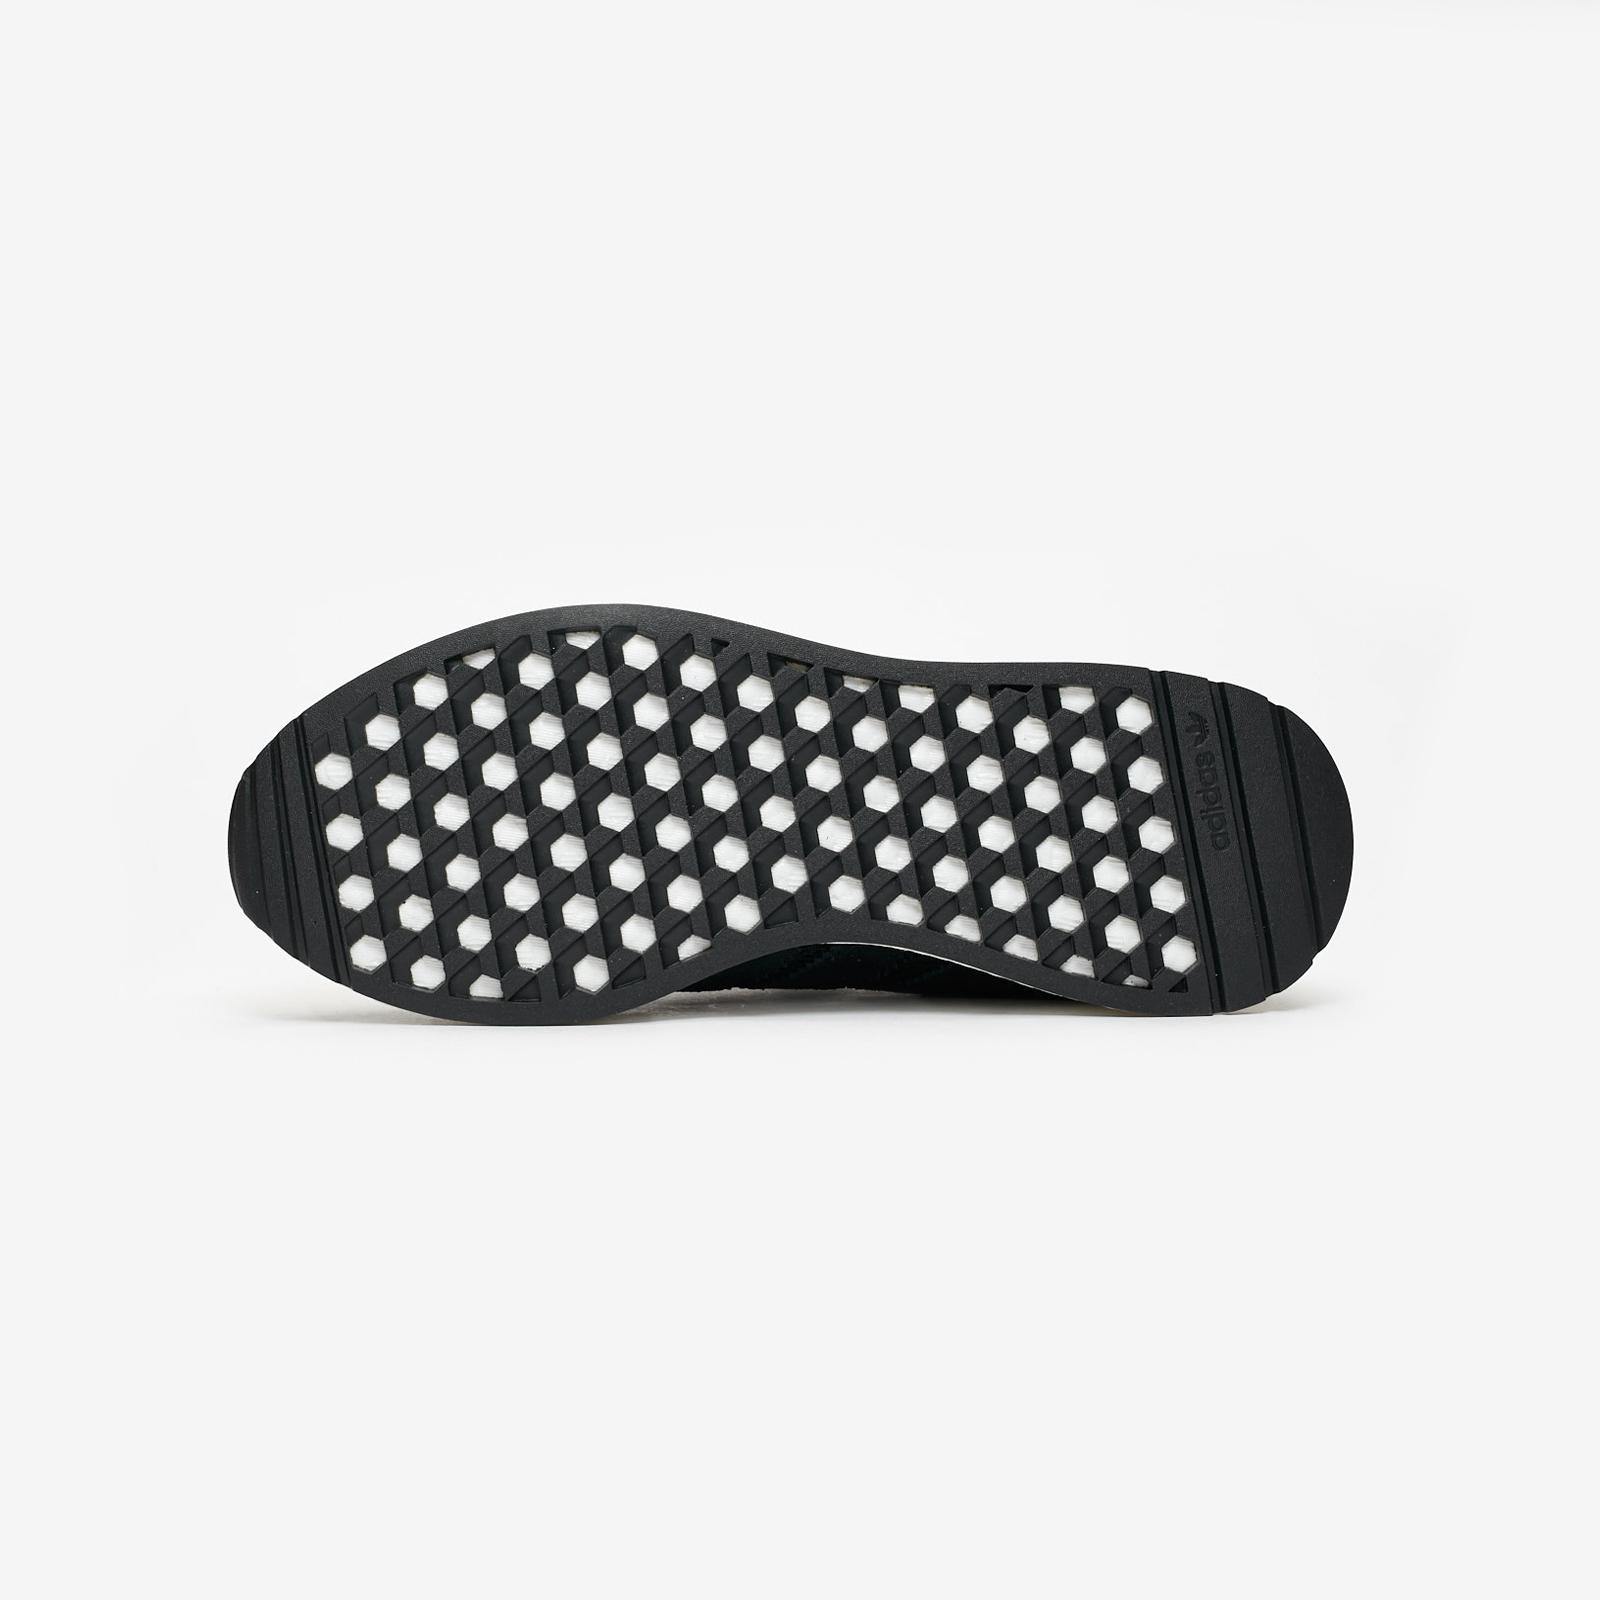 the latest 36743 9089c adidas I-5923 - D96608 - Sneakersnstuff   sneakers   streetwear online  since 1999